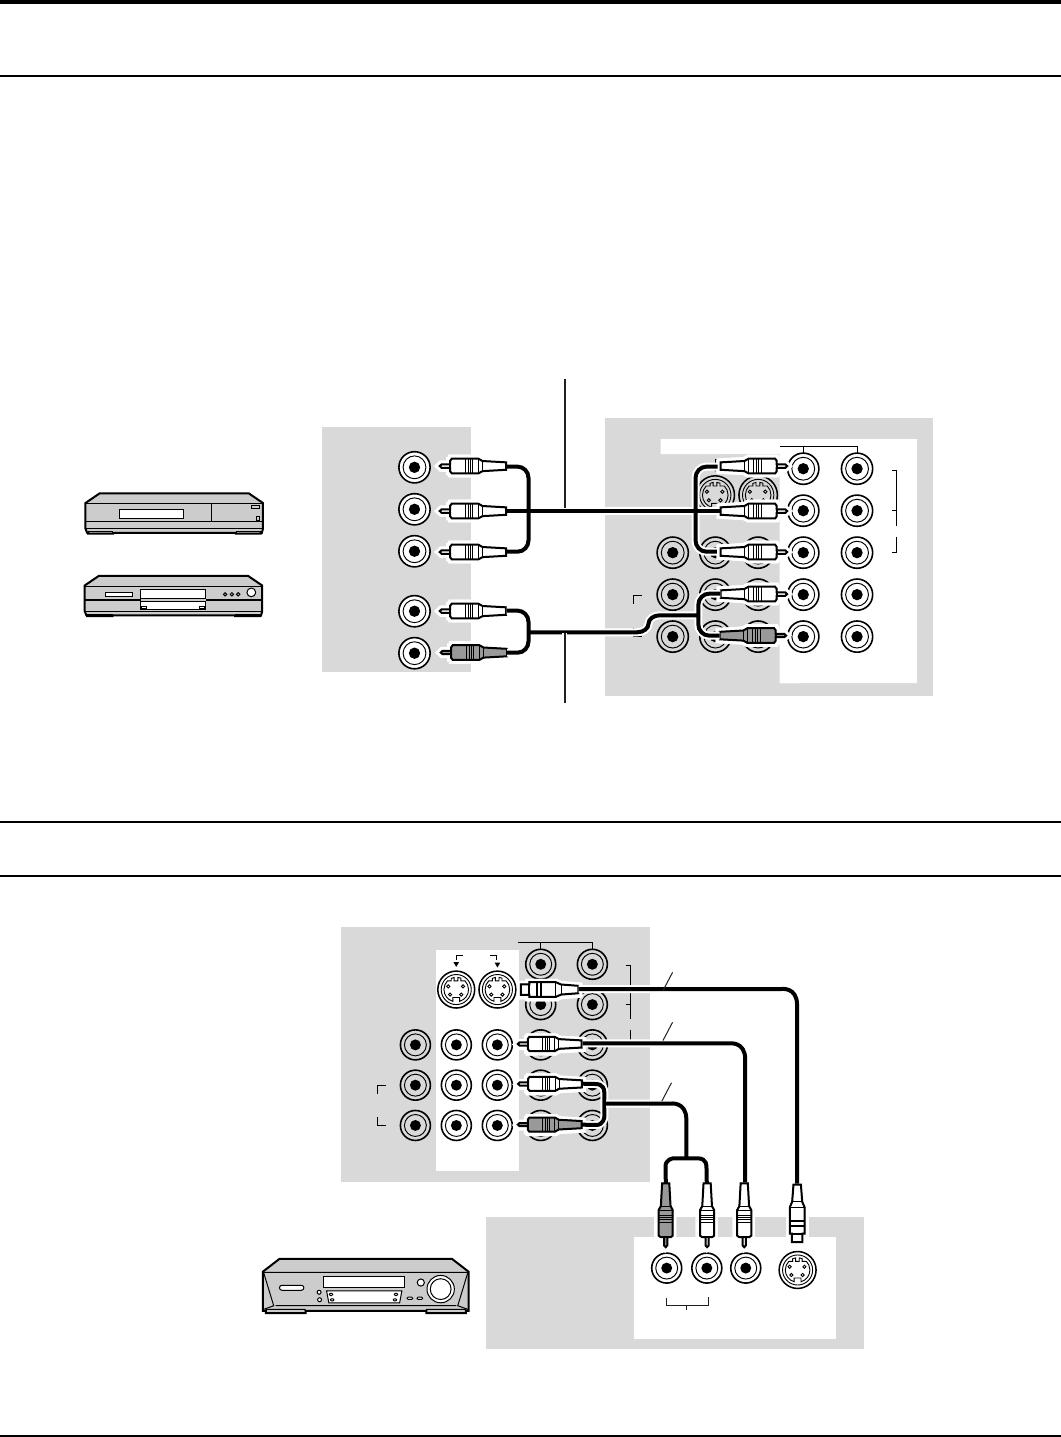 pip and vcr wiring diagram panasonic th 37pd25  th 42pd25 digital tv set top box  dtv stb  th 42pd25 digital tv set top box